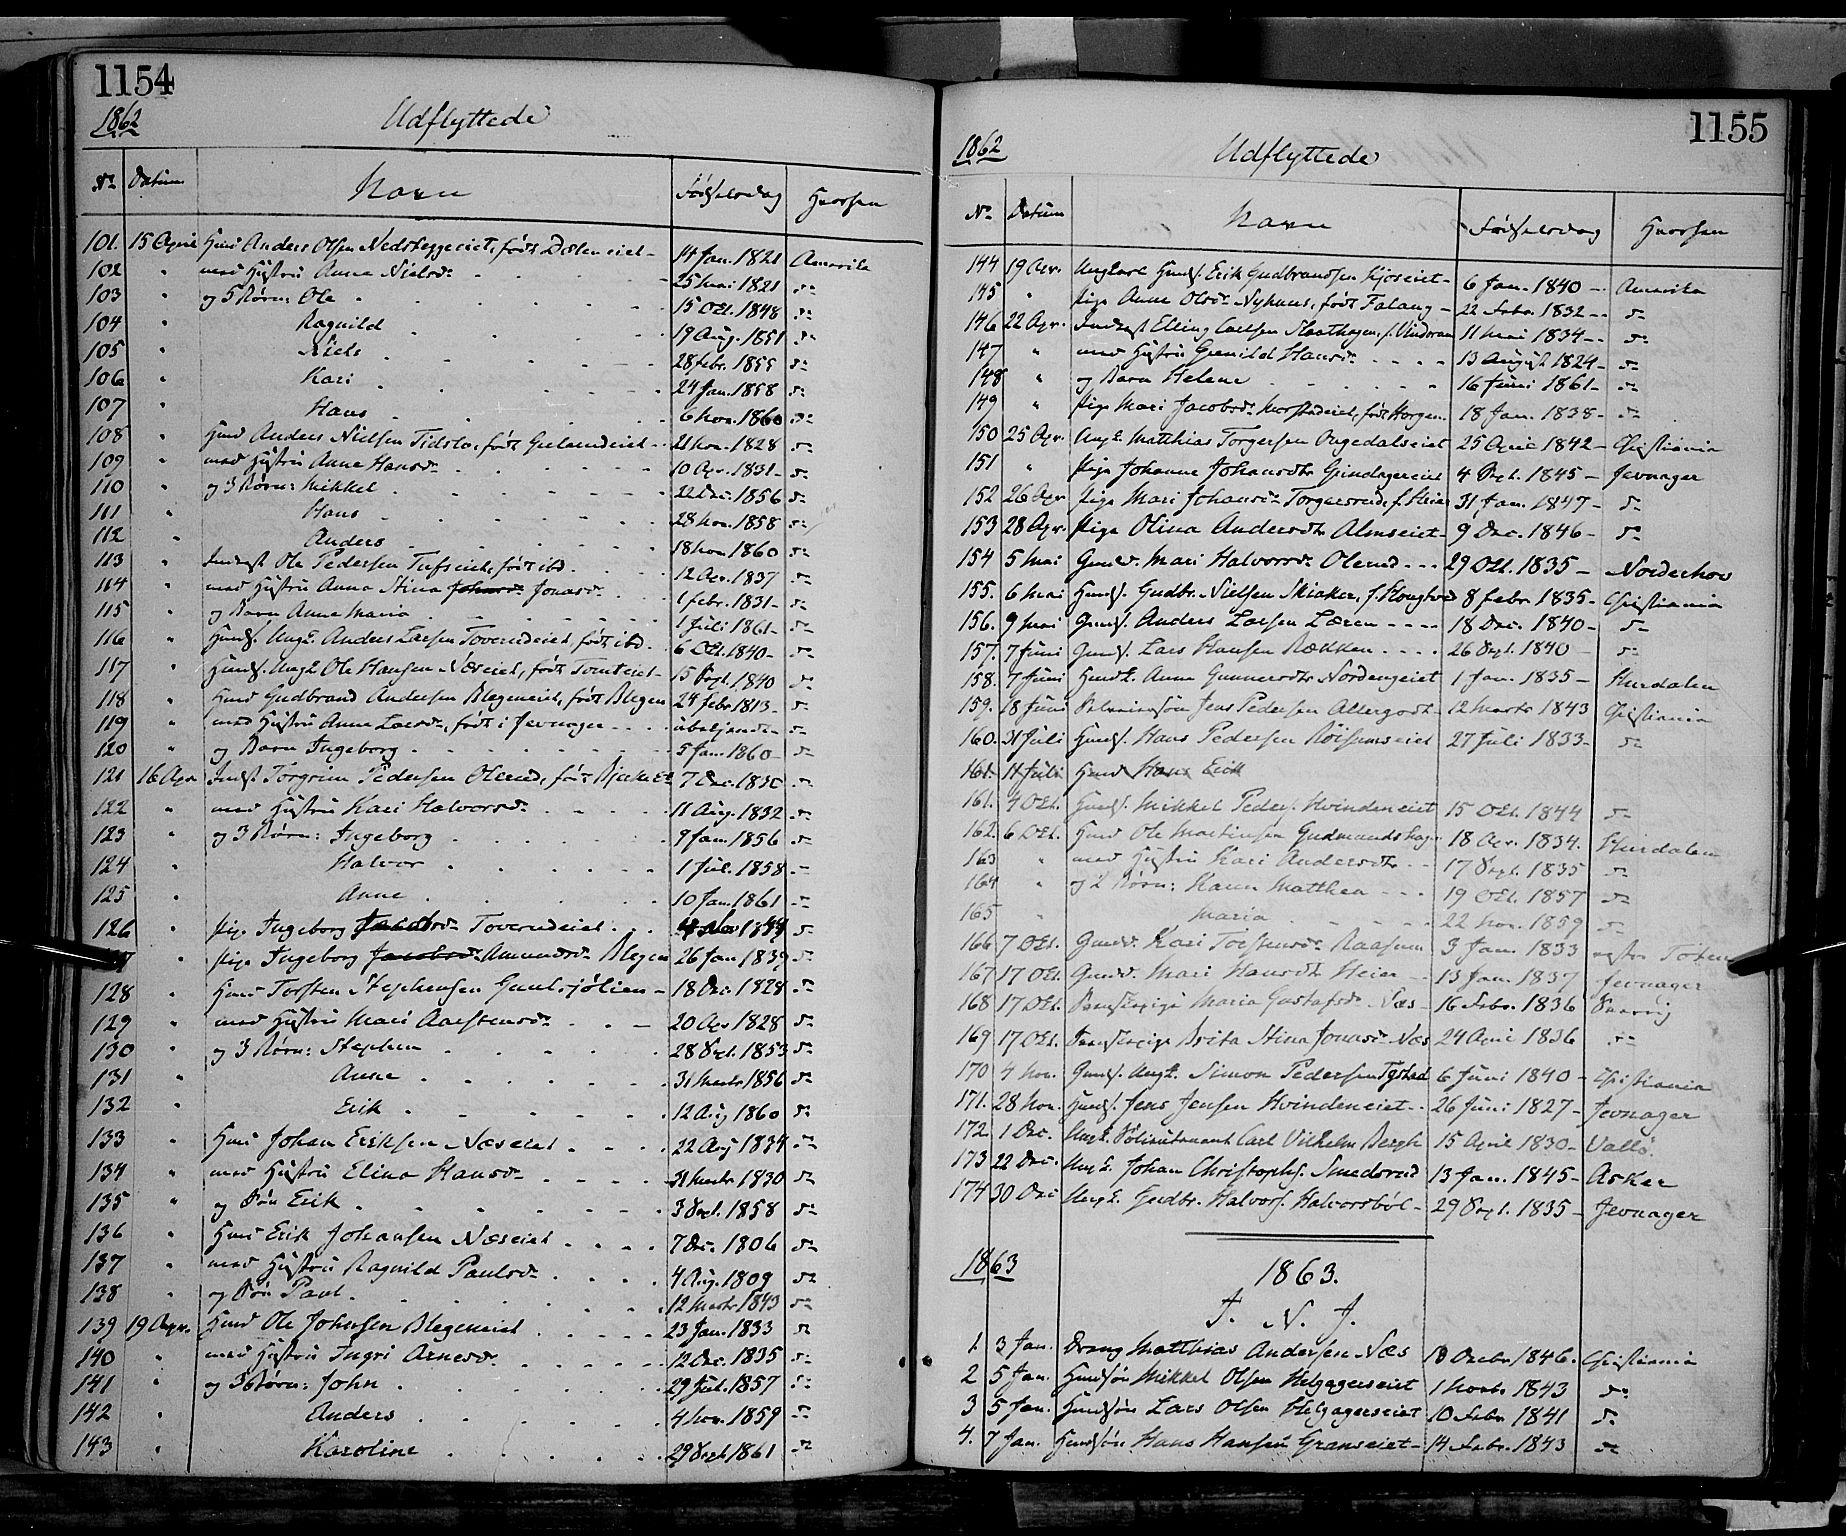 SAH, Gran prestekontor, Ministerialbok nr. 12, 1856-1874, s. 1154-1155